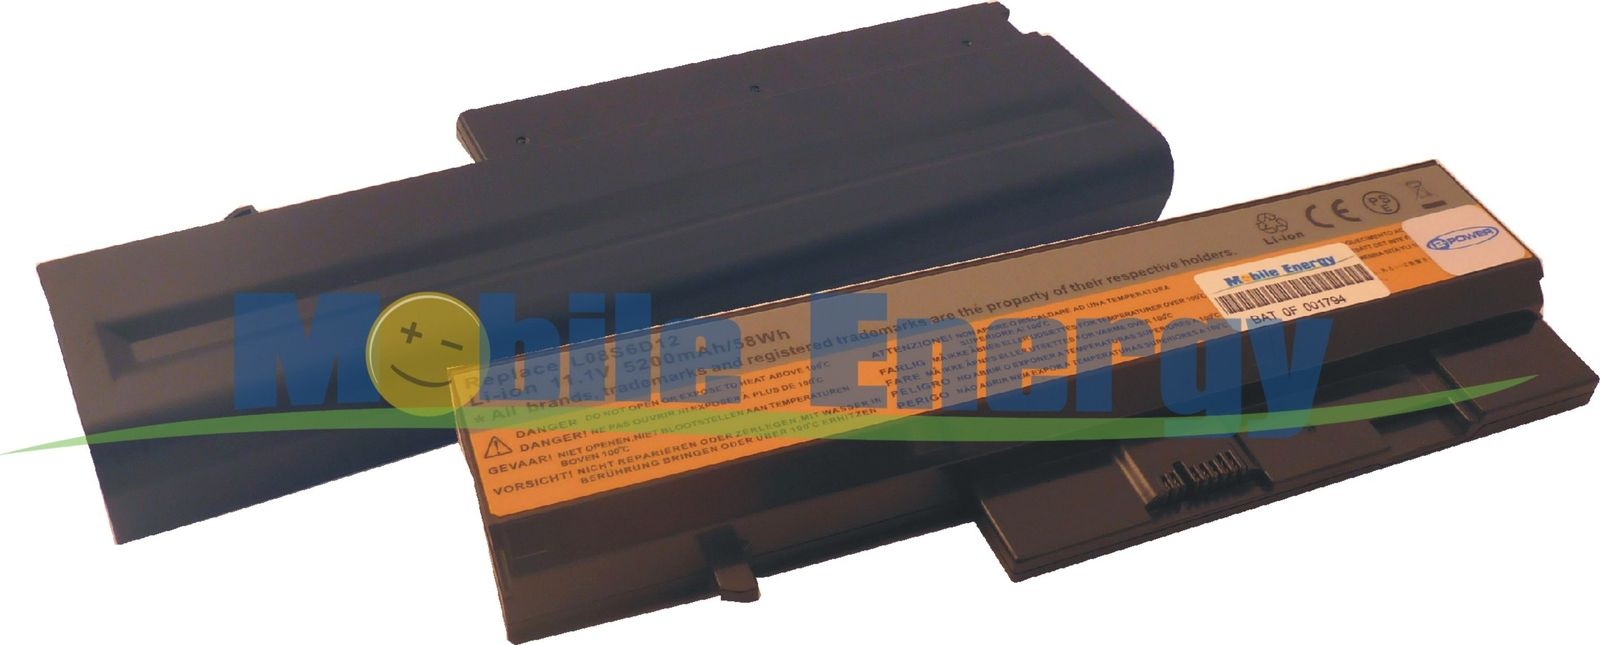 Mobile-Energy Baterie Lenovo IdeaPad U330 / V350 / Y330 - 11.1v